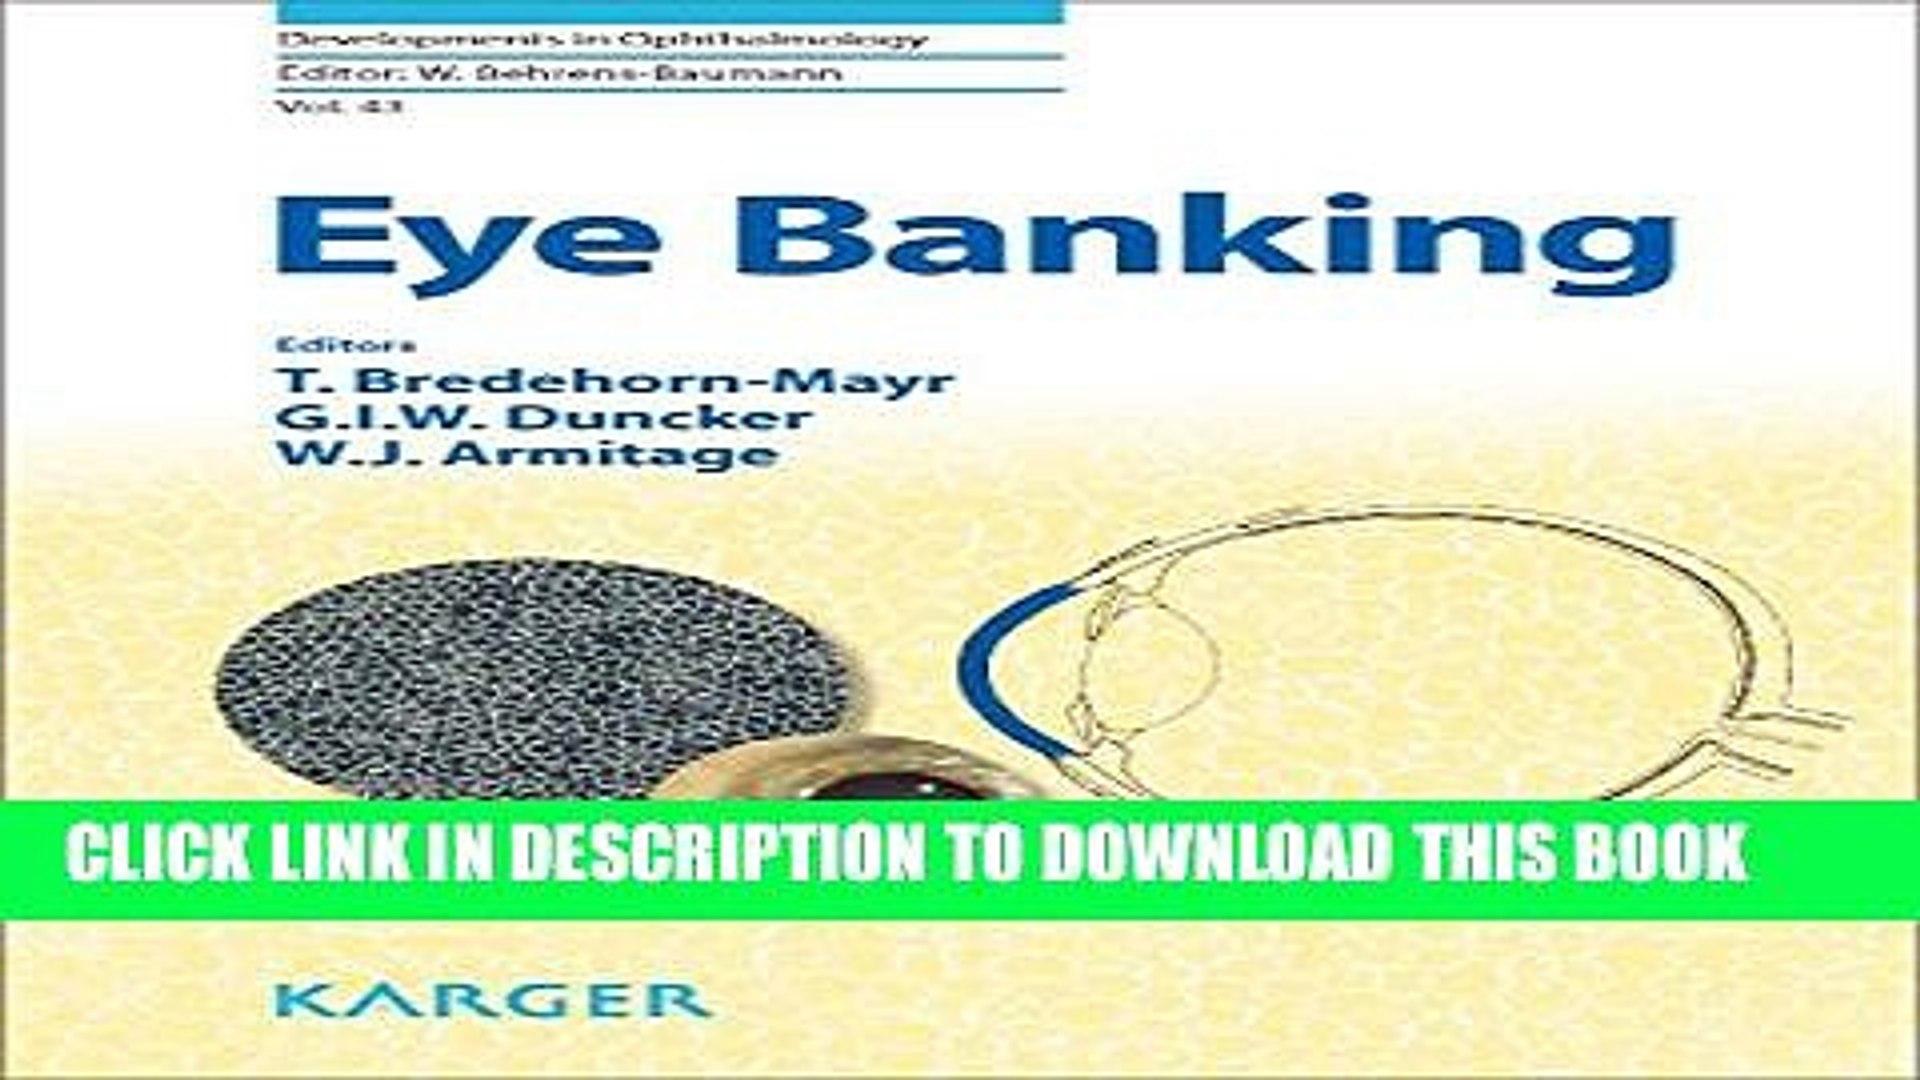 [PDF] Eye Banking (Developments in Ophthalmology, Vol. 43) Popular Online